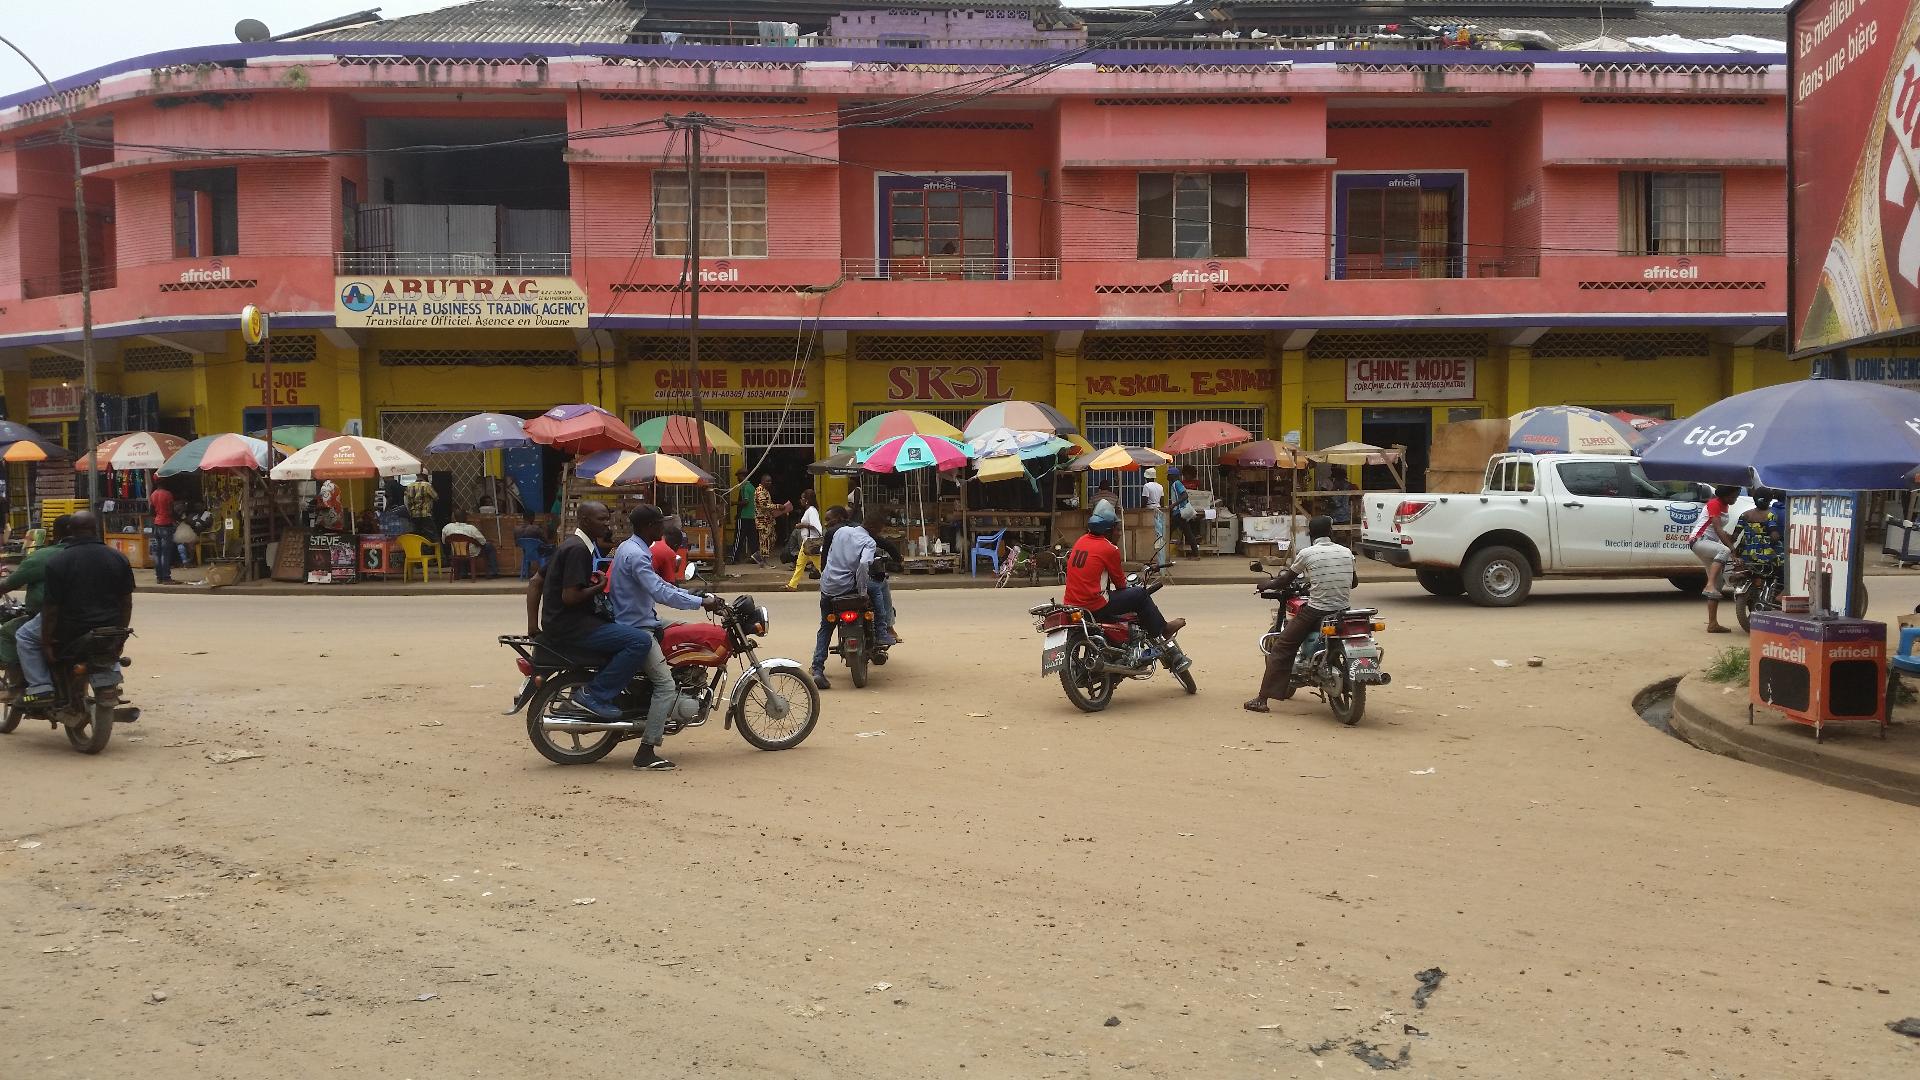 Boma Town Centre